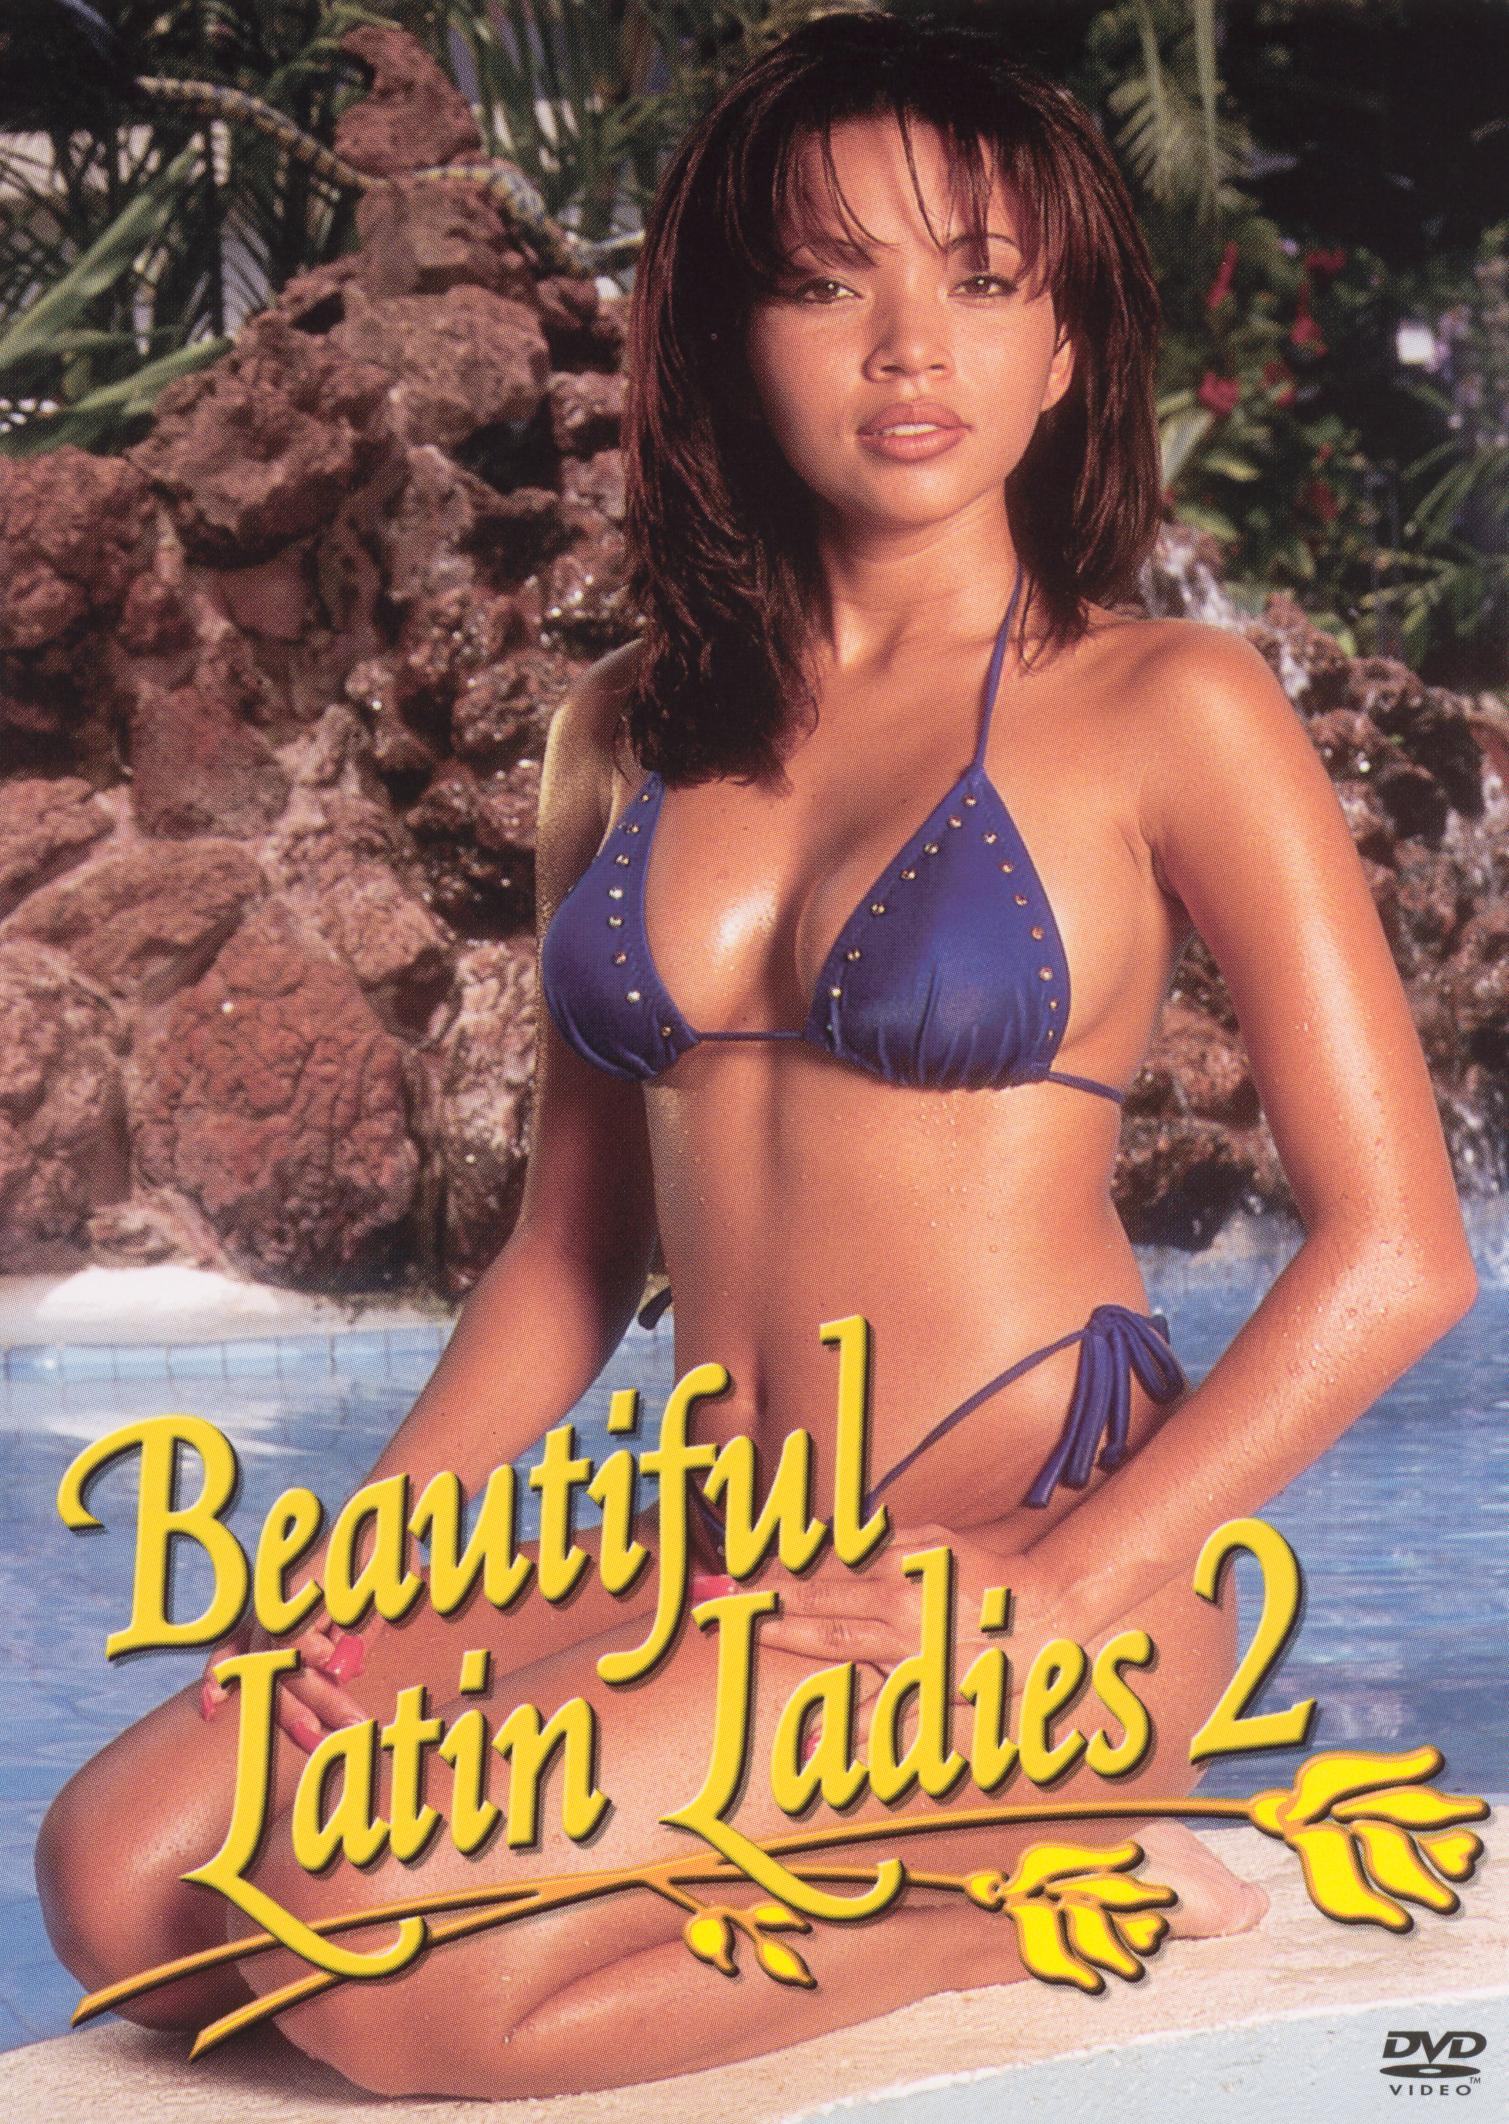 Beautiful Latin Ladies, Vol. 2